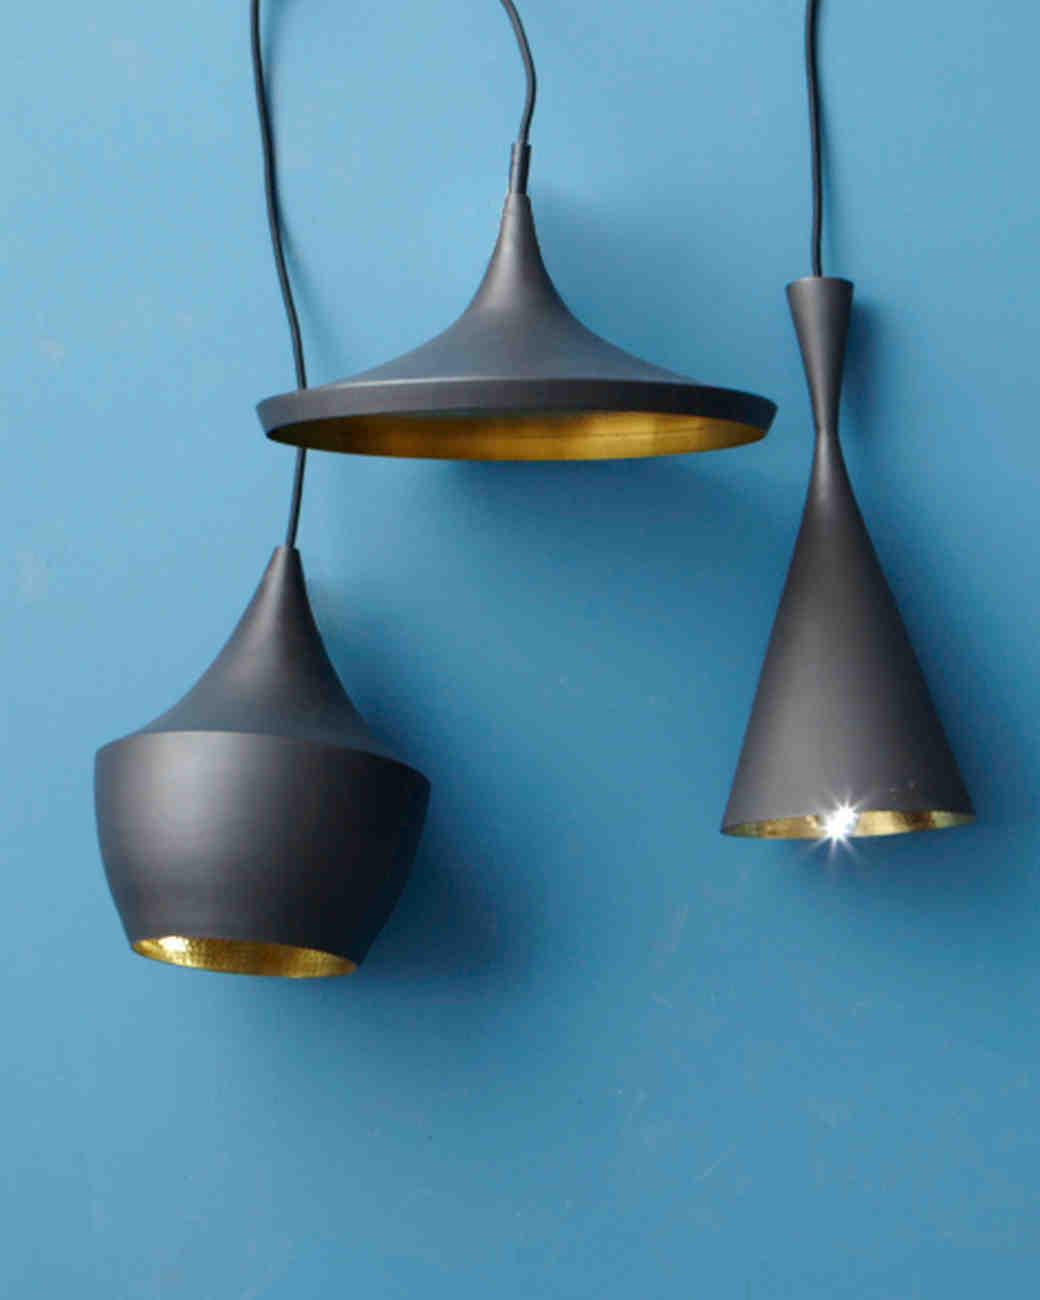 registry-property-lamp-002-wd108979.jpg